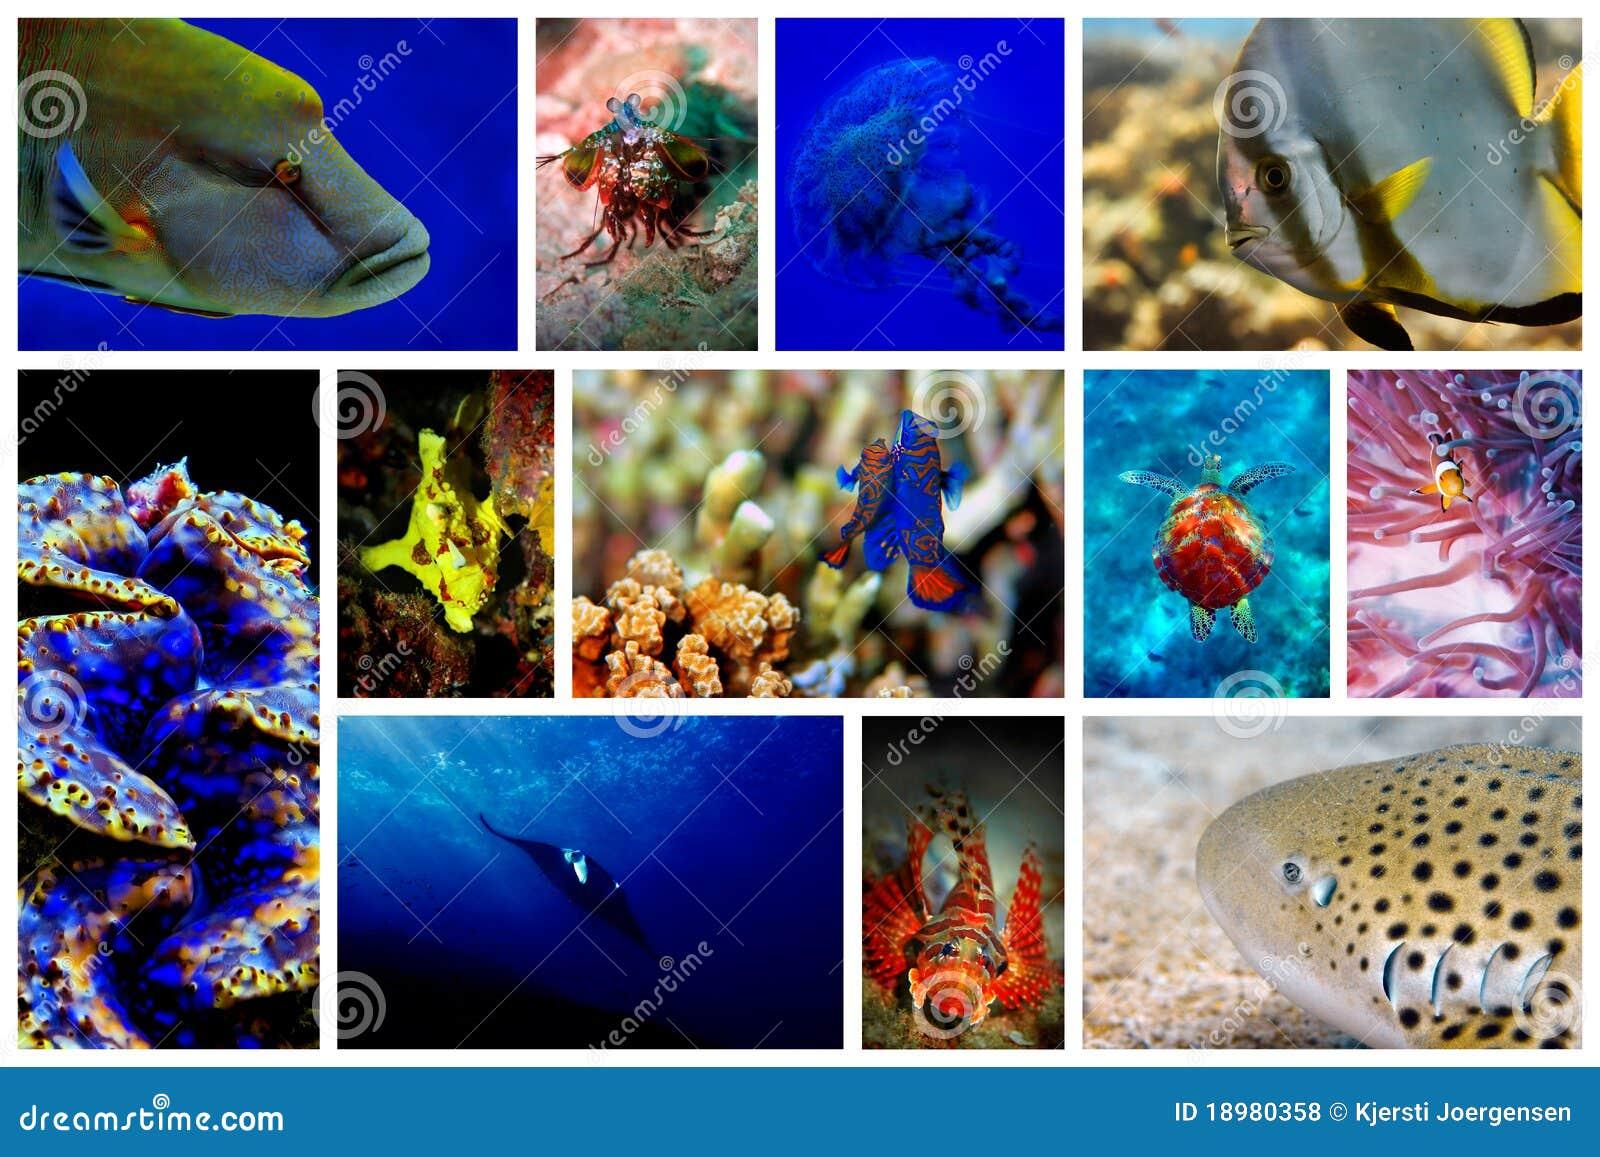 Download Underwater stock photo. Image of mantis, anglerfish, clownfish - 18980358